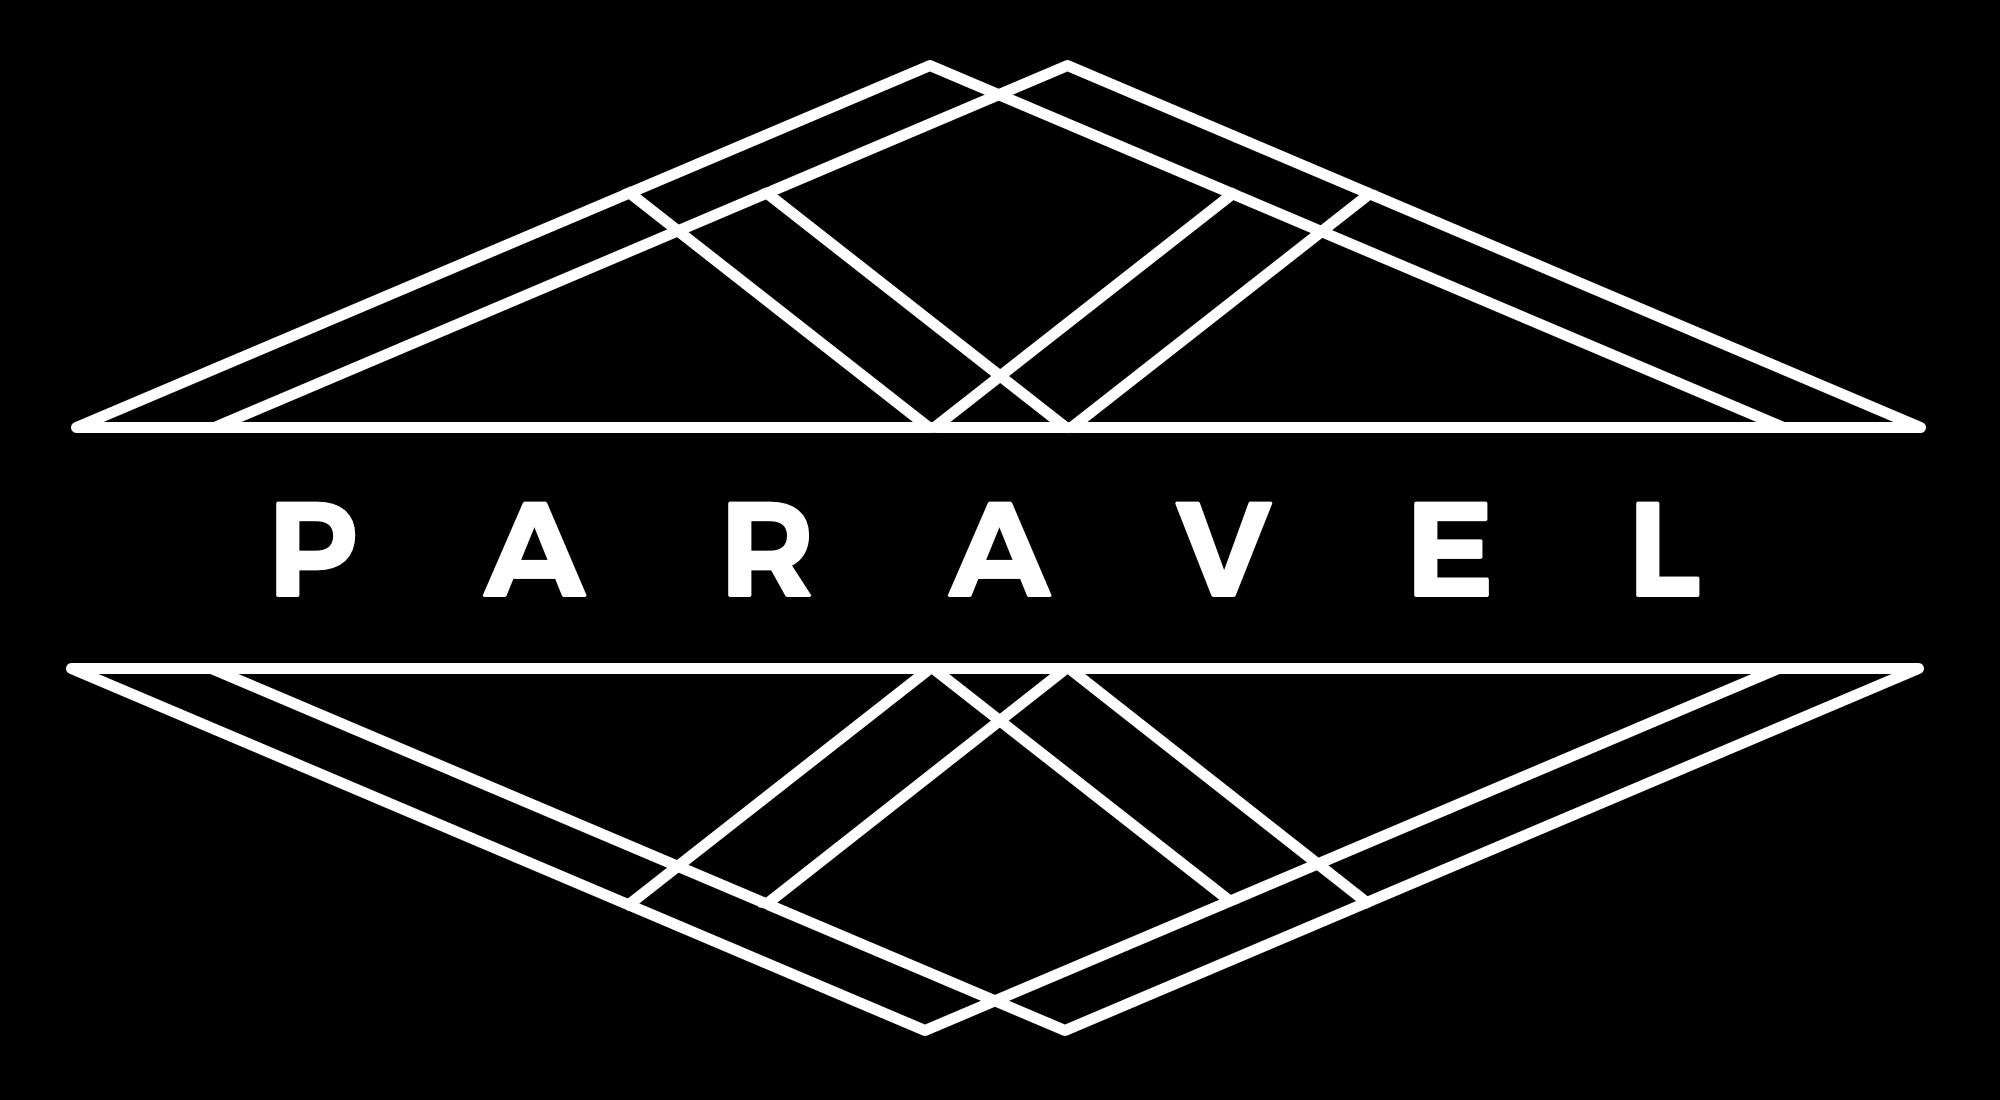 PARAVEL geometry logo - light logo:black background.png